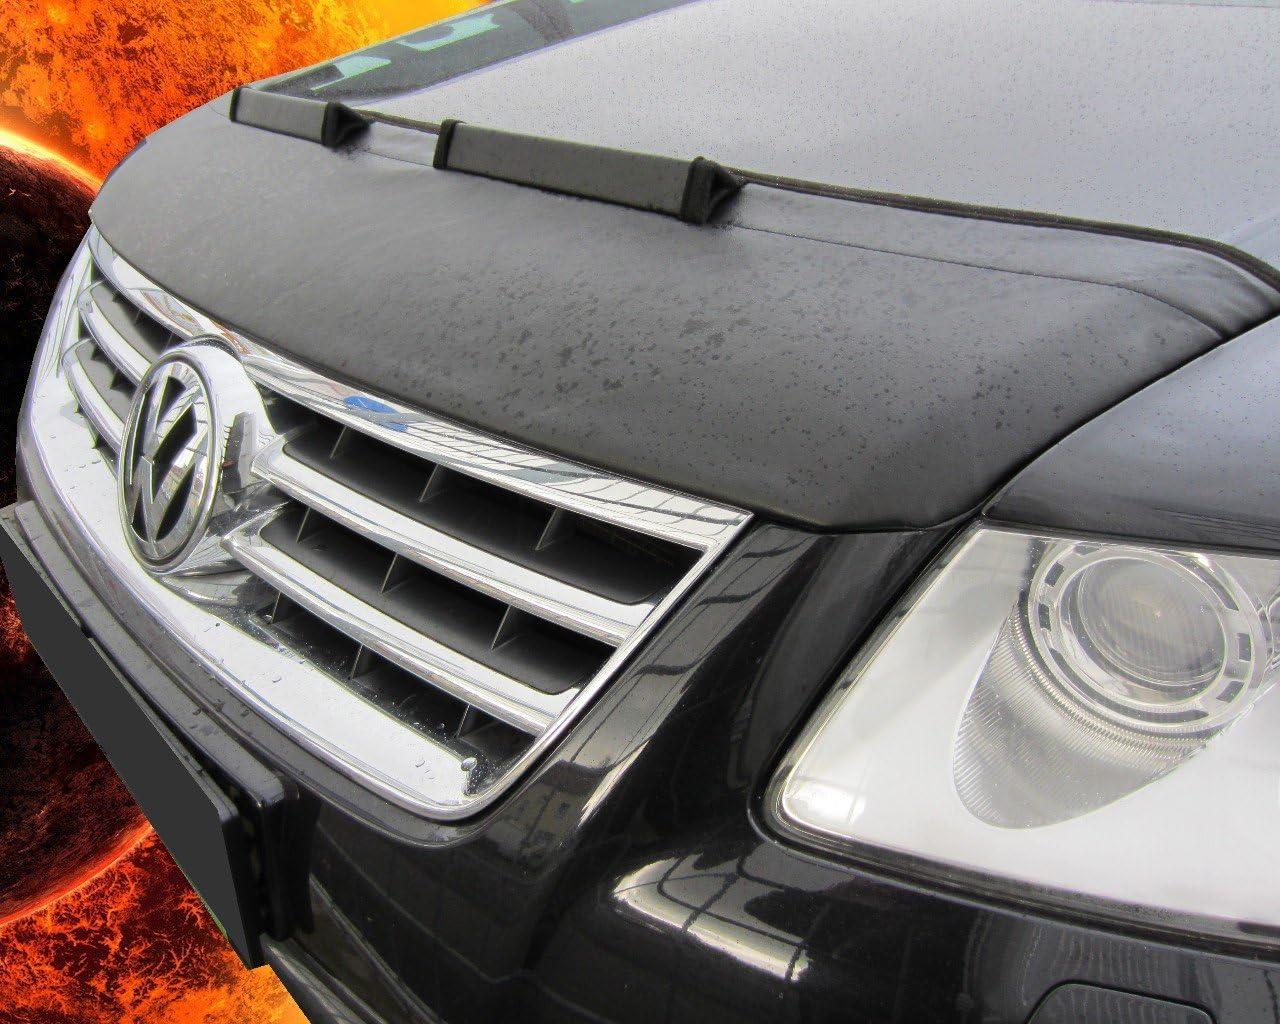 Hood Bra Front End Nose Mask for VW Volkswagen Touareg 2002-2010 Bonnet Bra STONEGUARD Protector Tuning